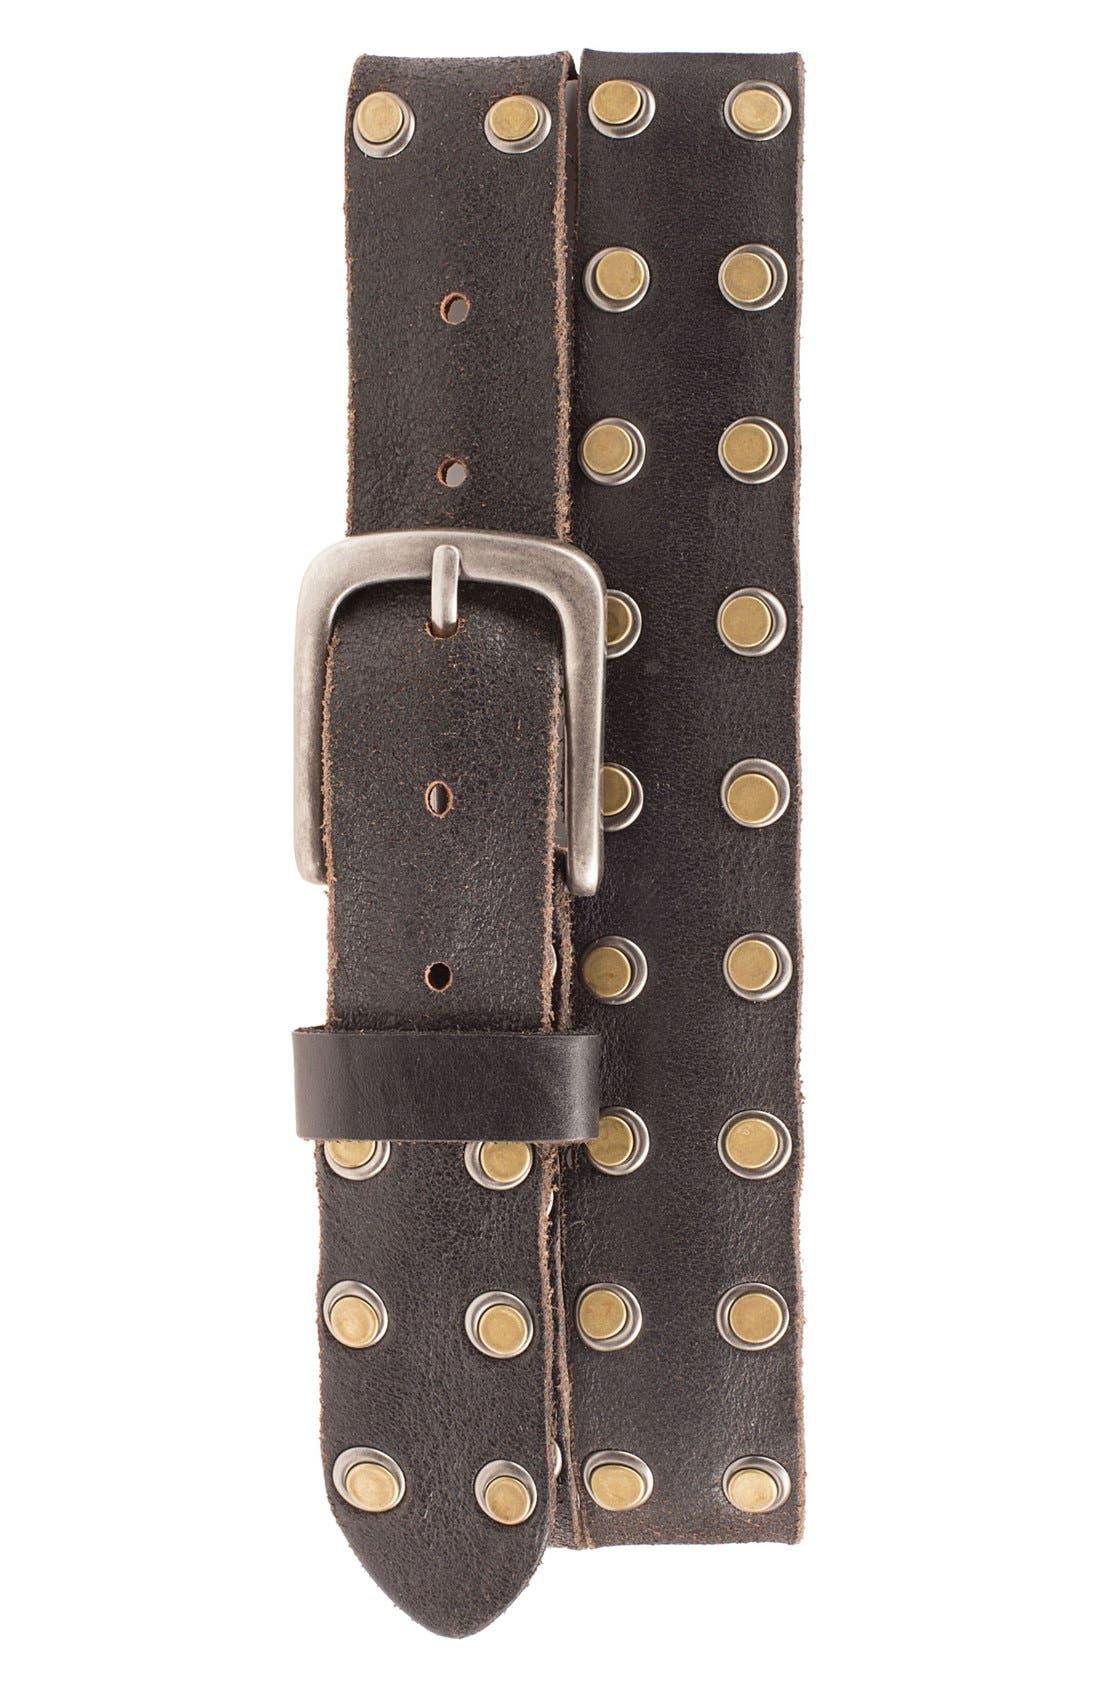 Alternate Image 1 Selected - Bill Adler 1981 'Outlaw' Leather Belt